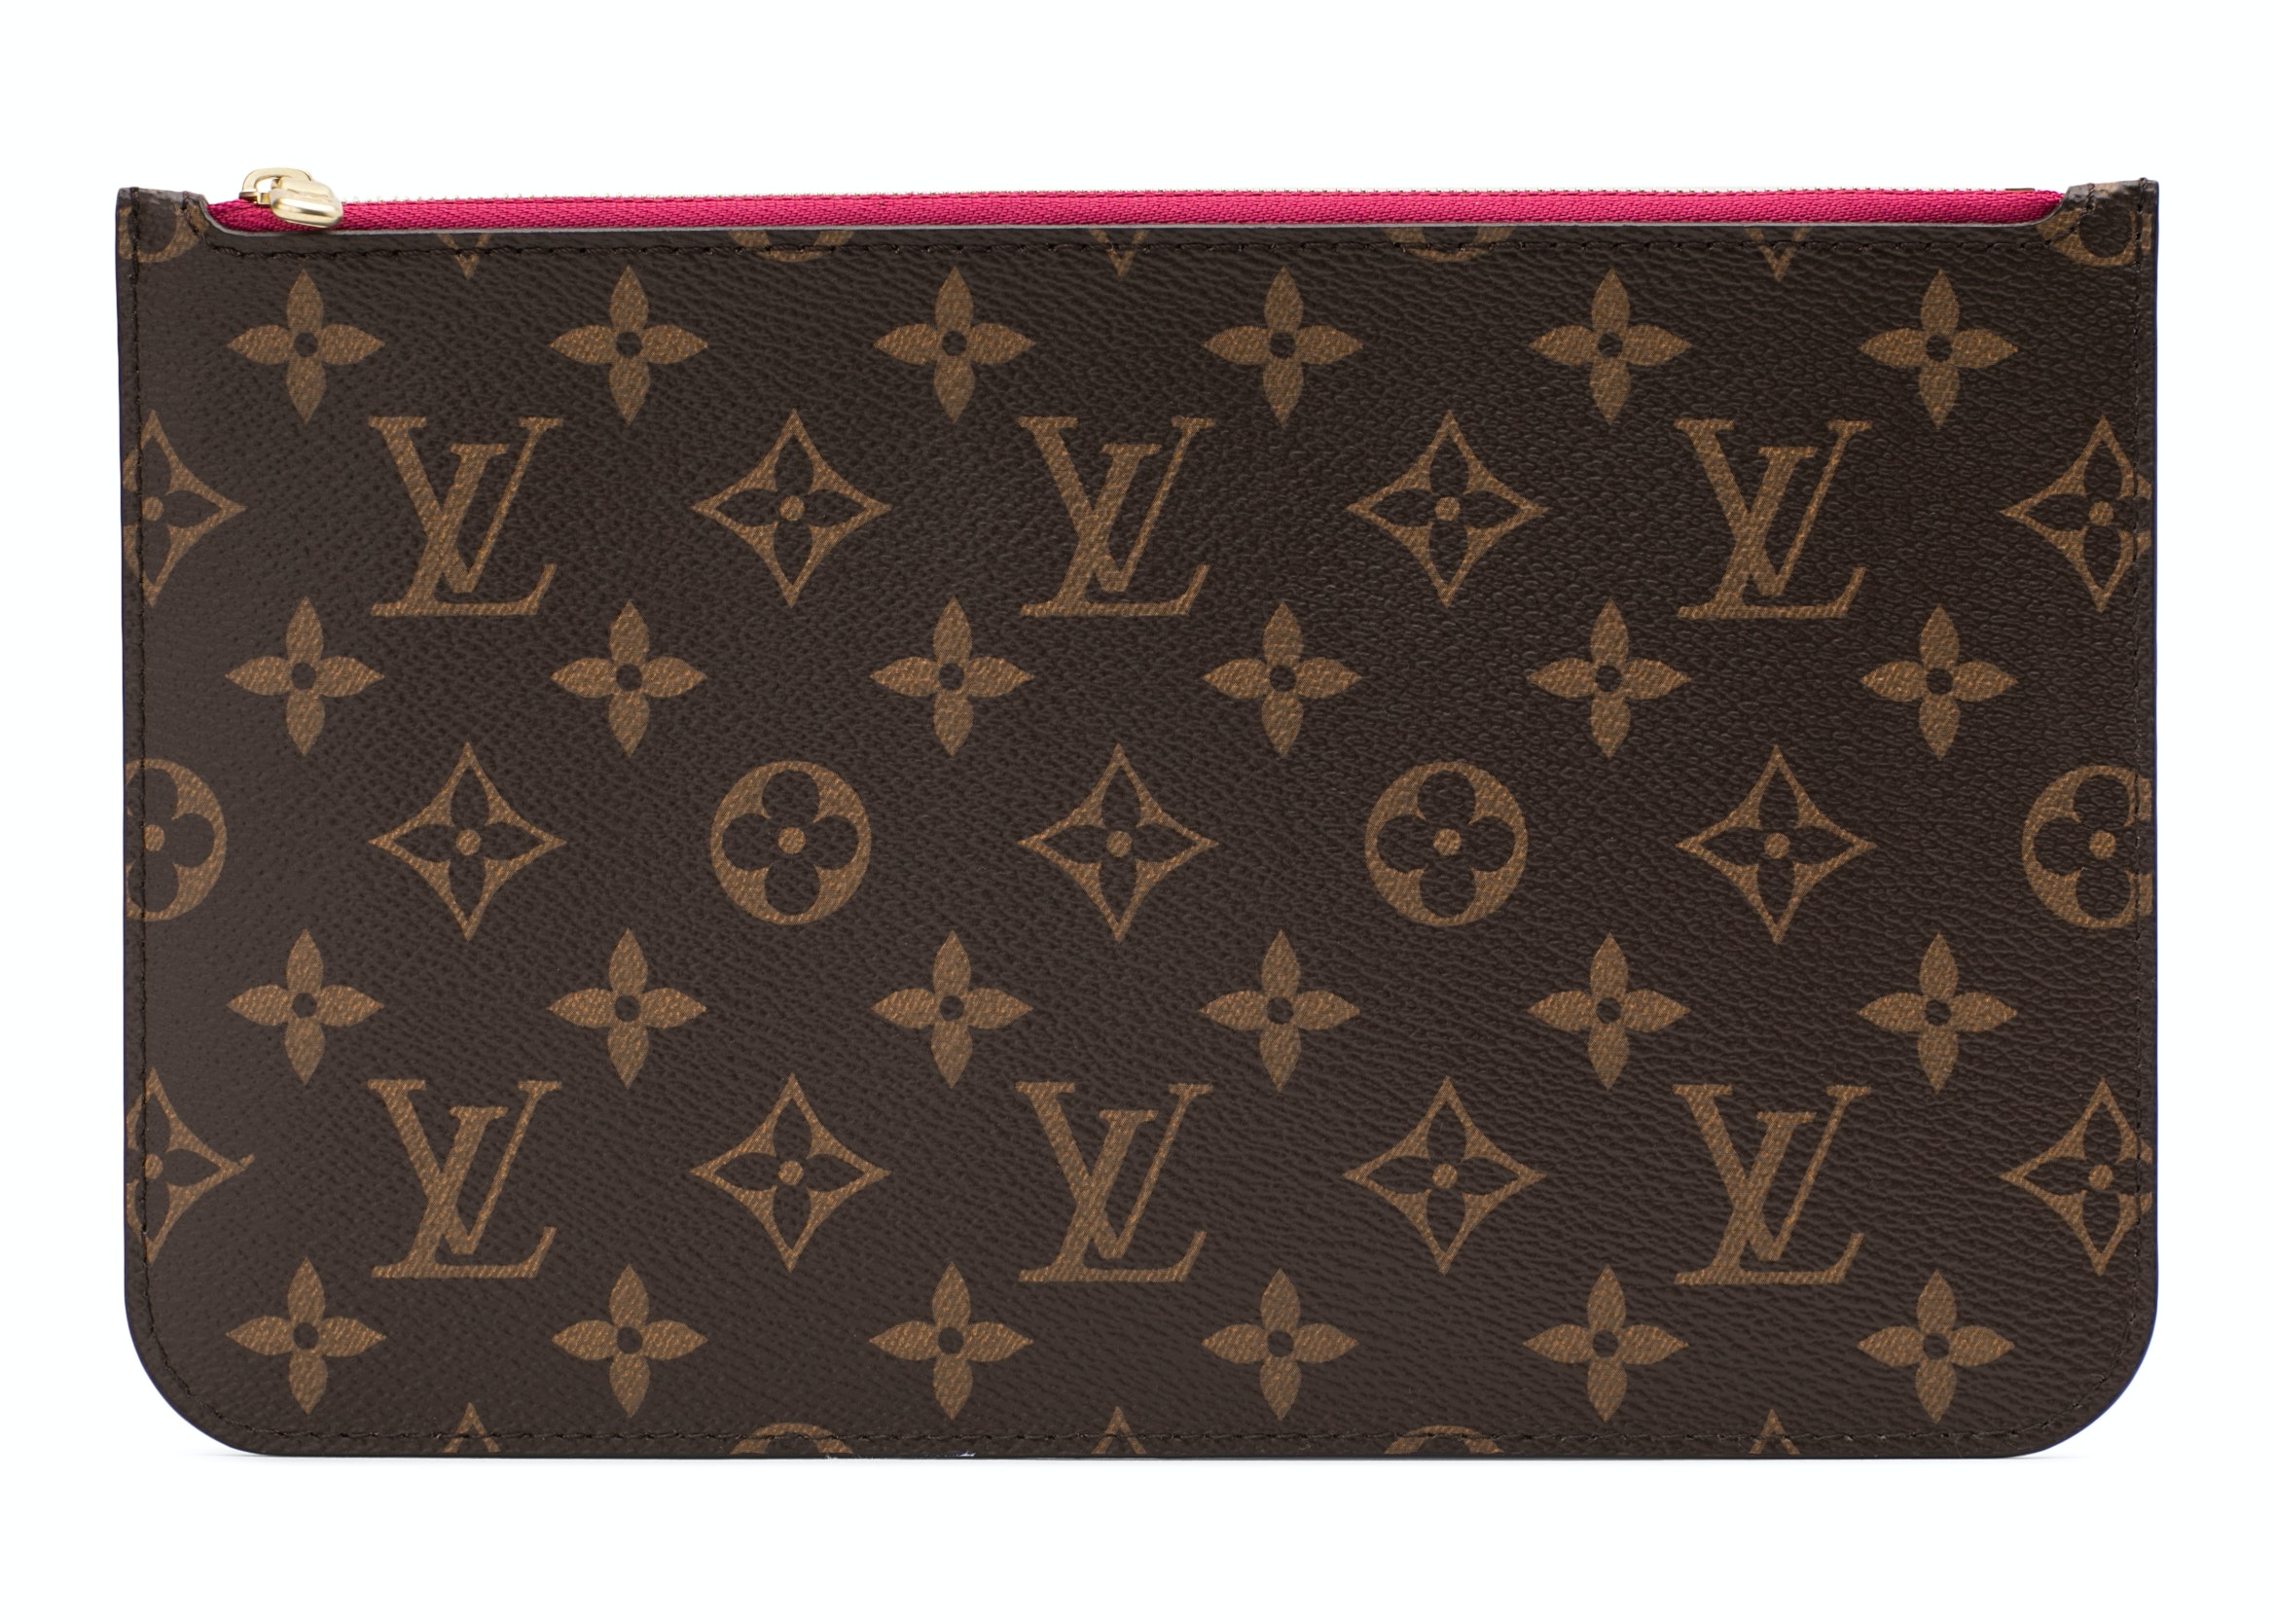 Louis Vuitton Neverfull Pochette Monogram Brown Pivoine